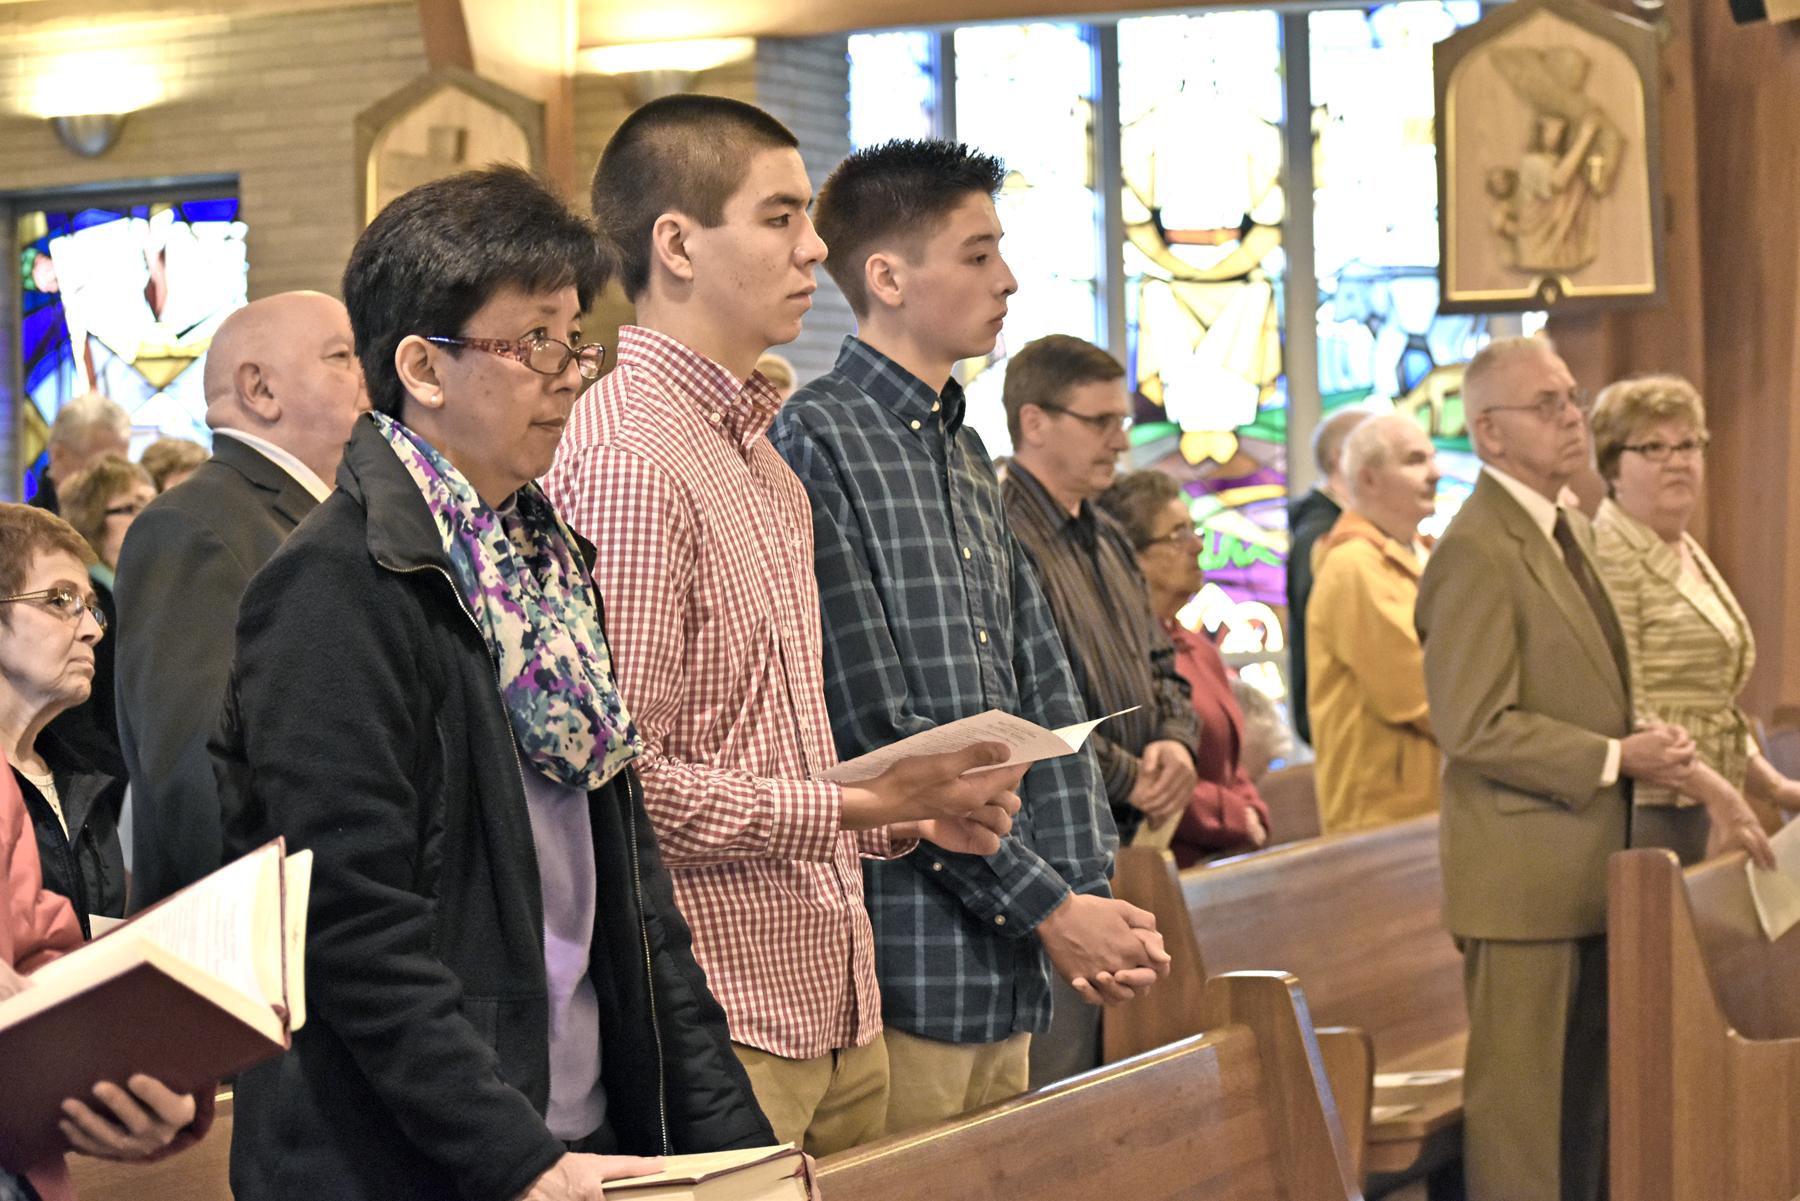 Congregants pray